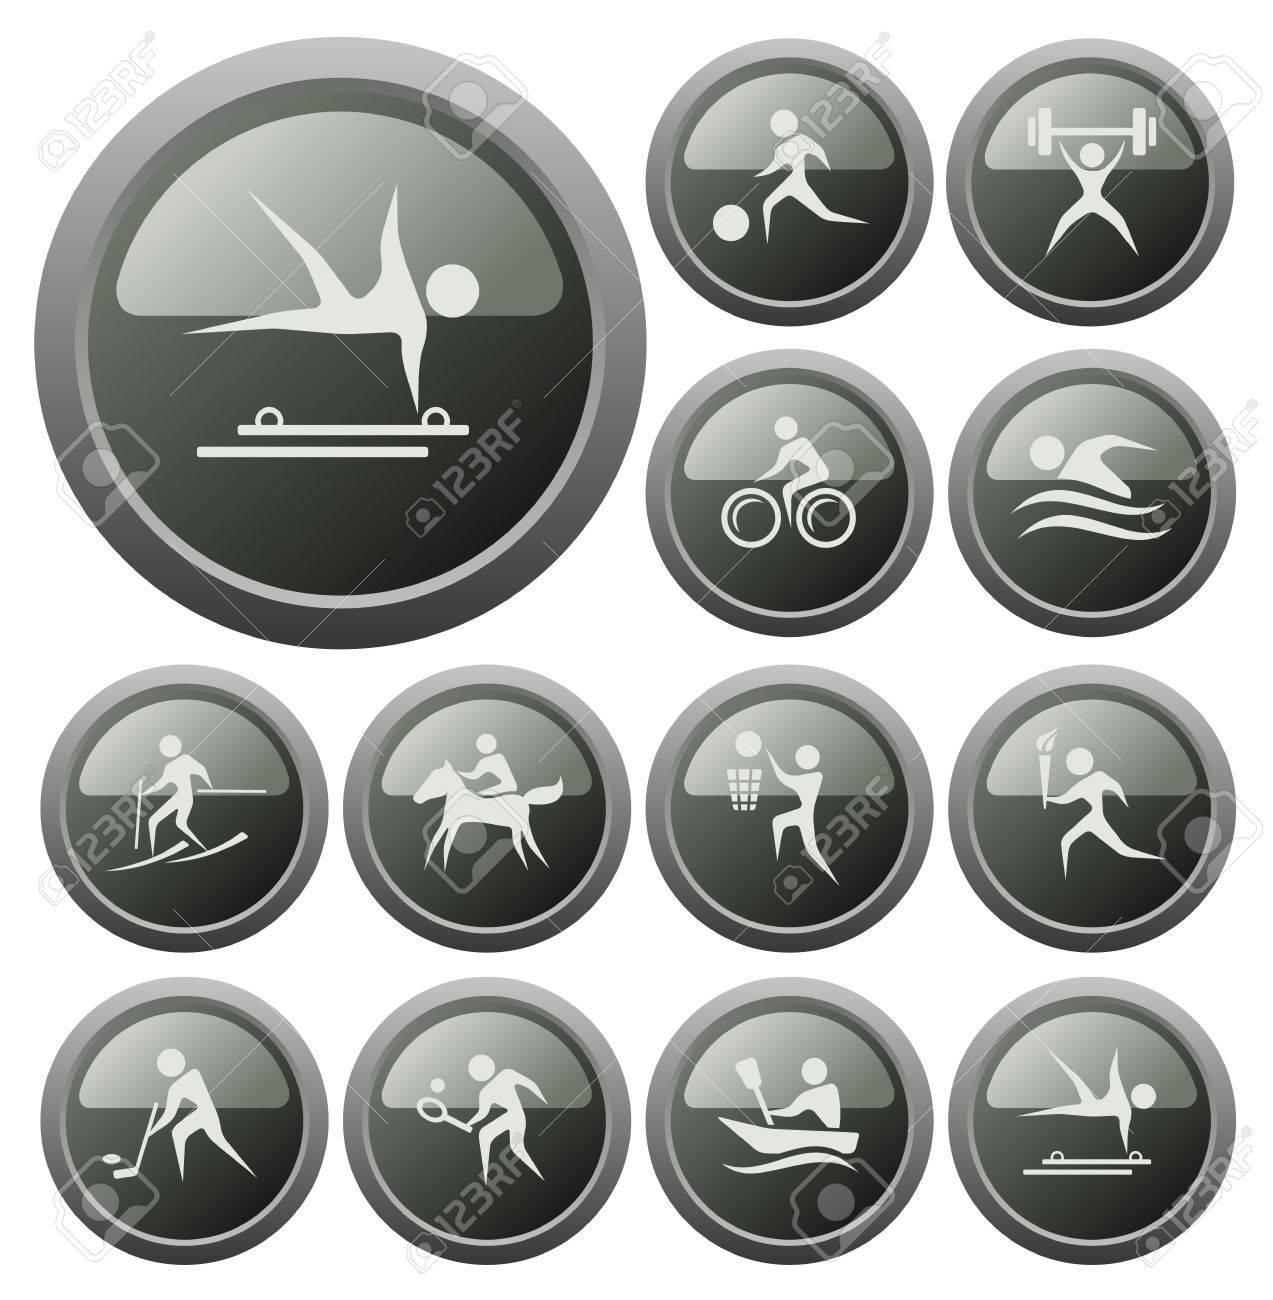 Sport button set Stock Vector - 18539917